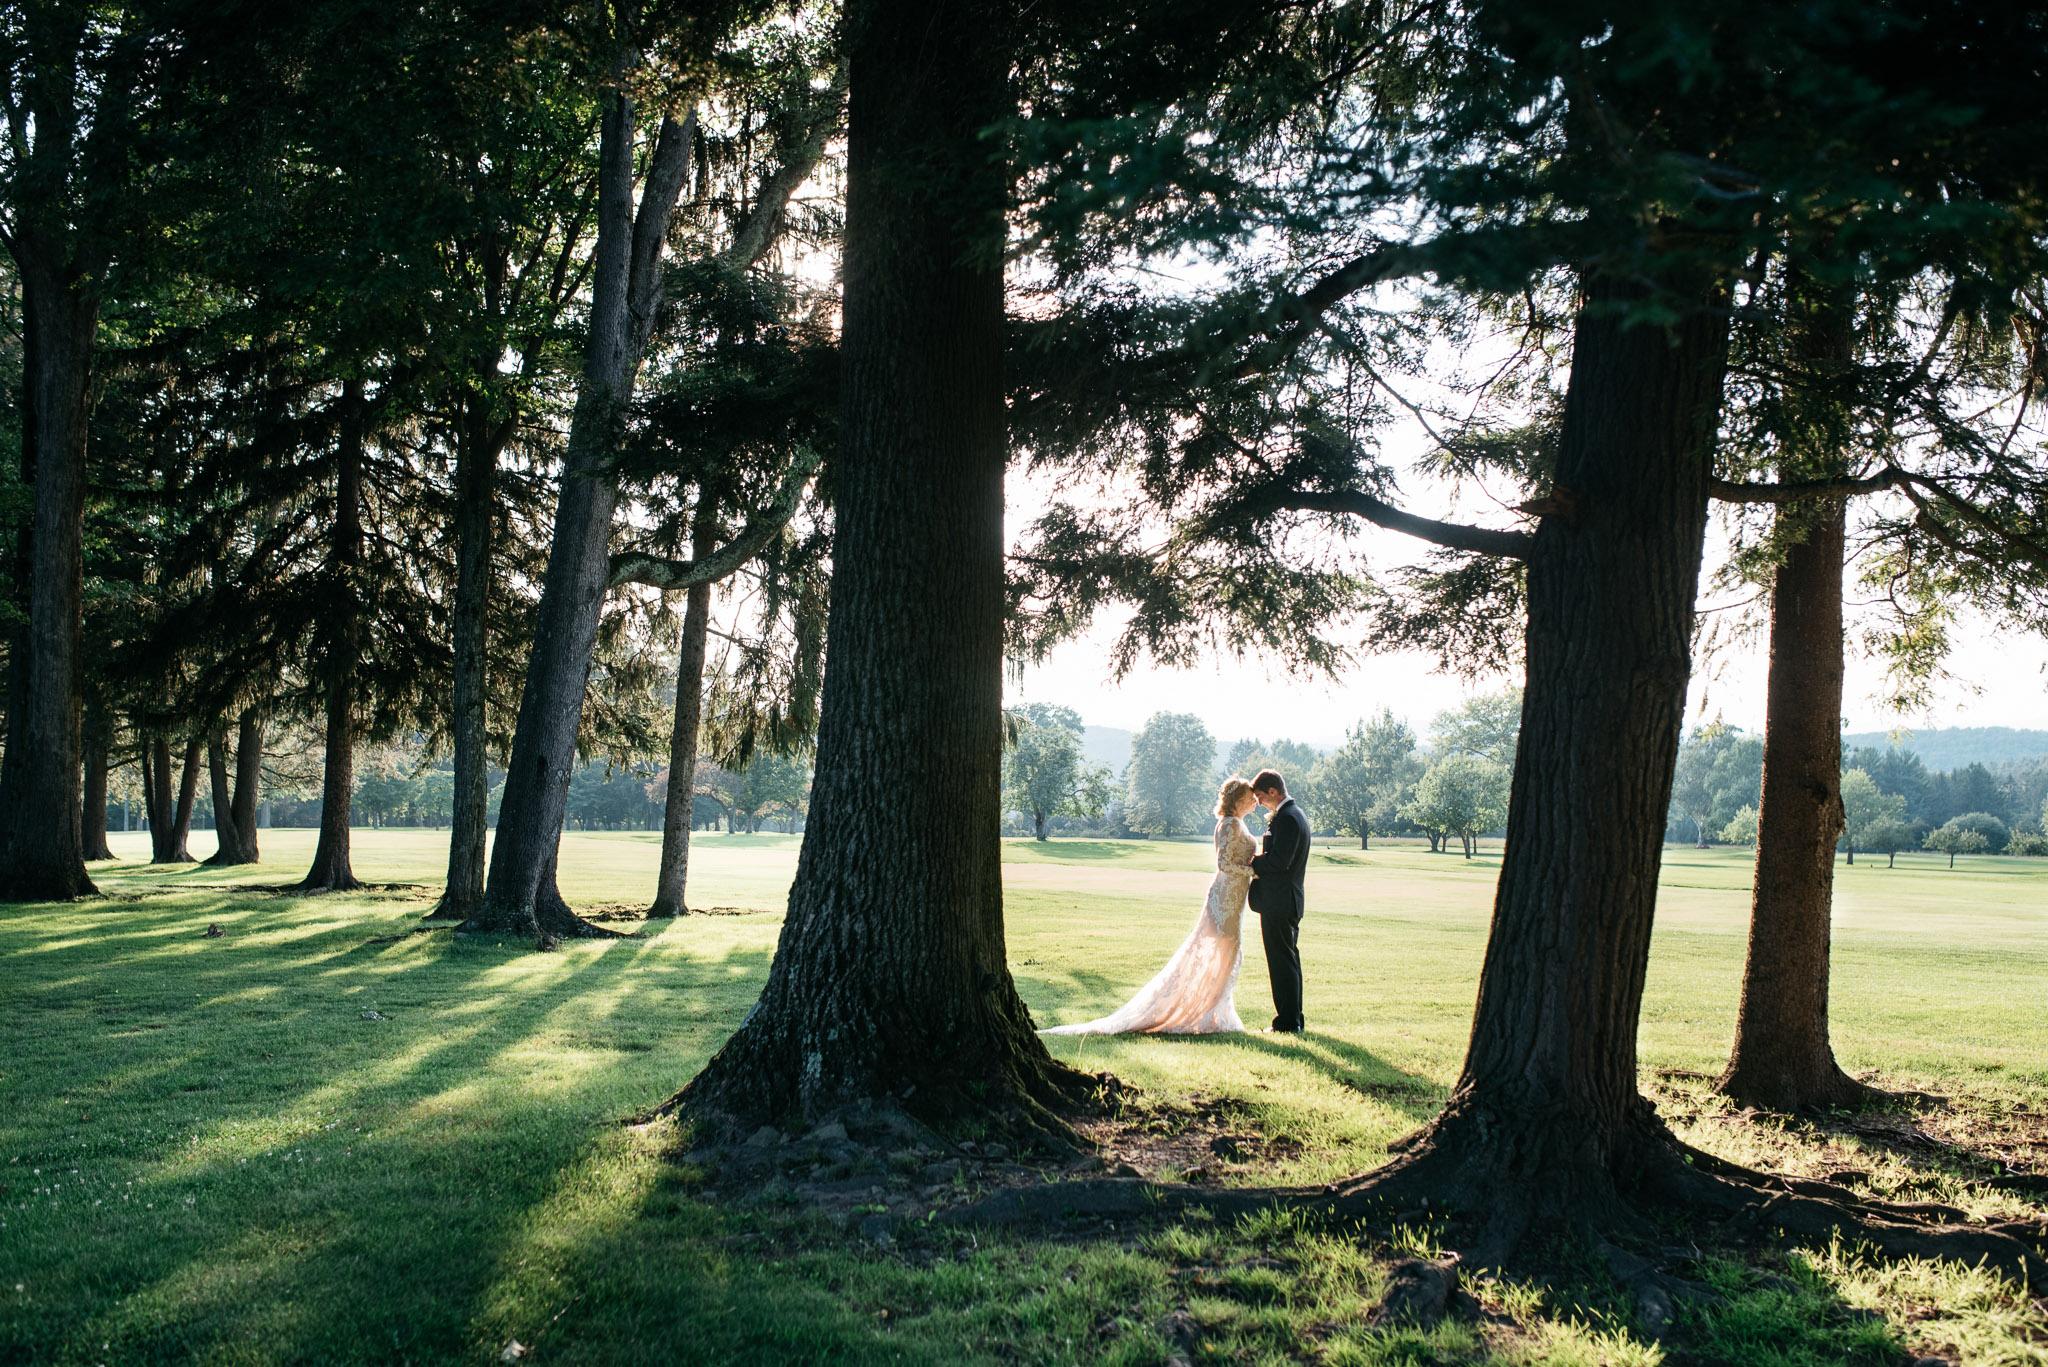 Ligonier & Pittsburgh wedding photographer mariah fisher-1006.jpg